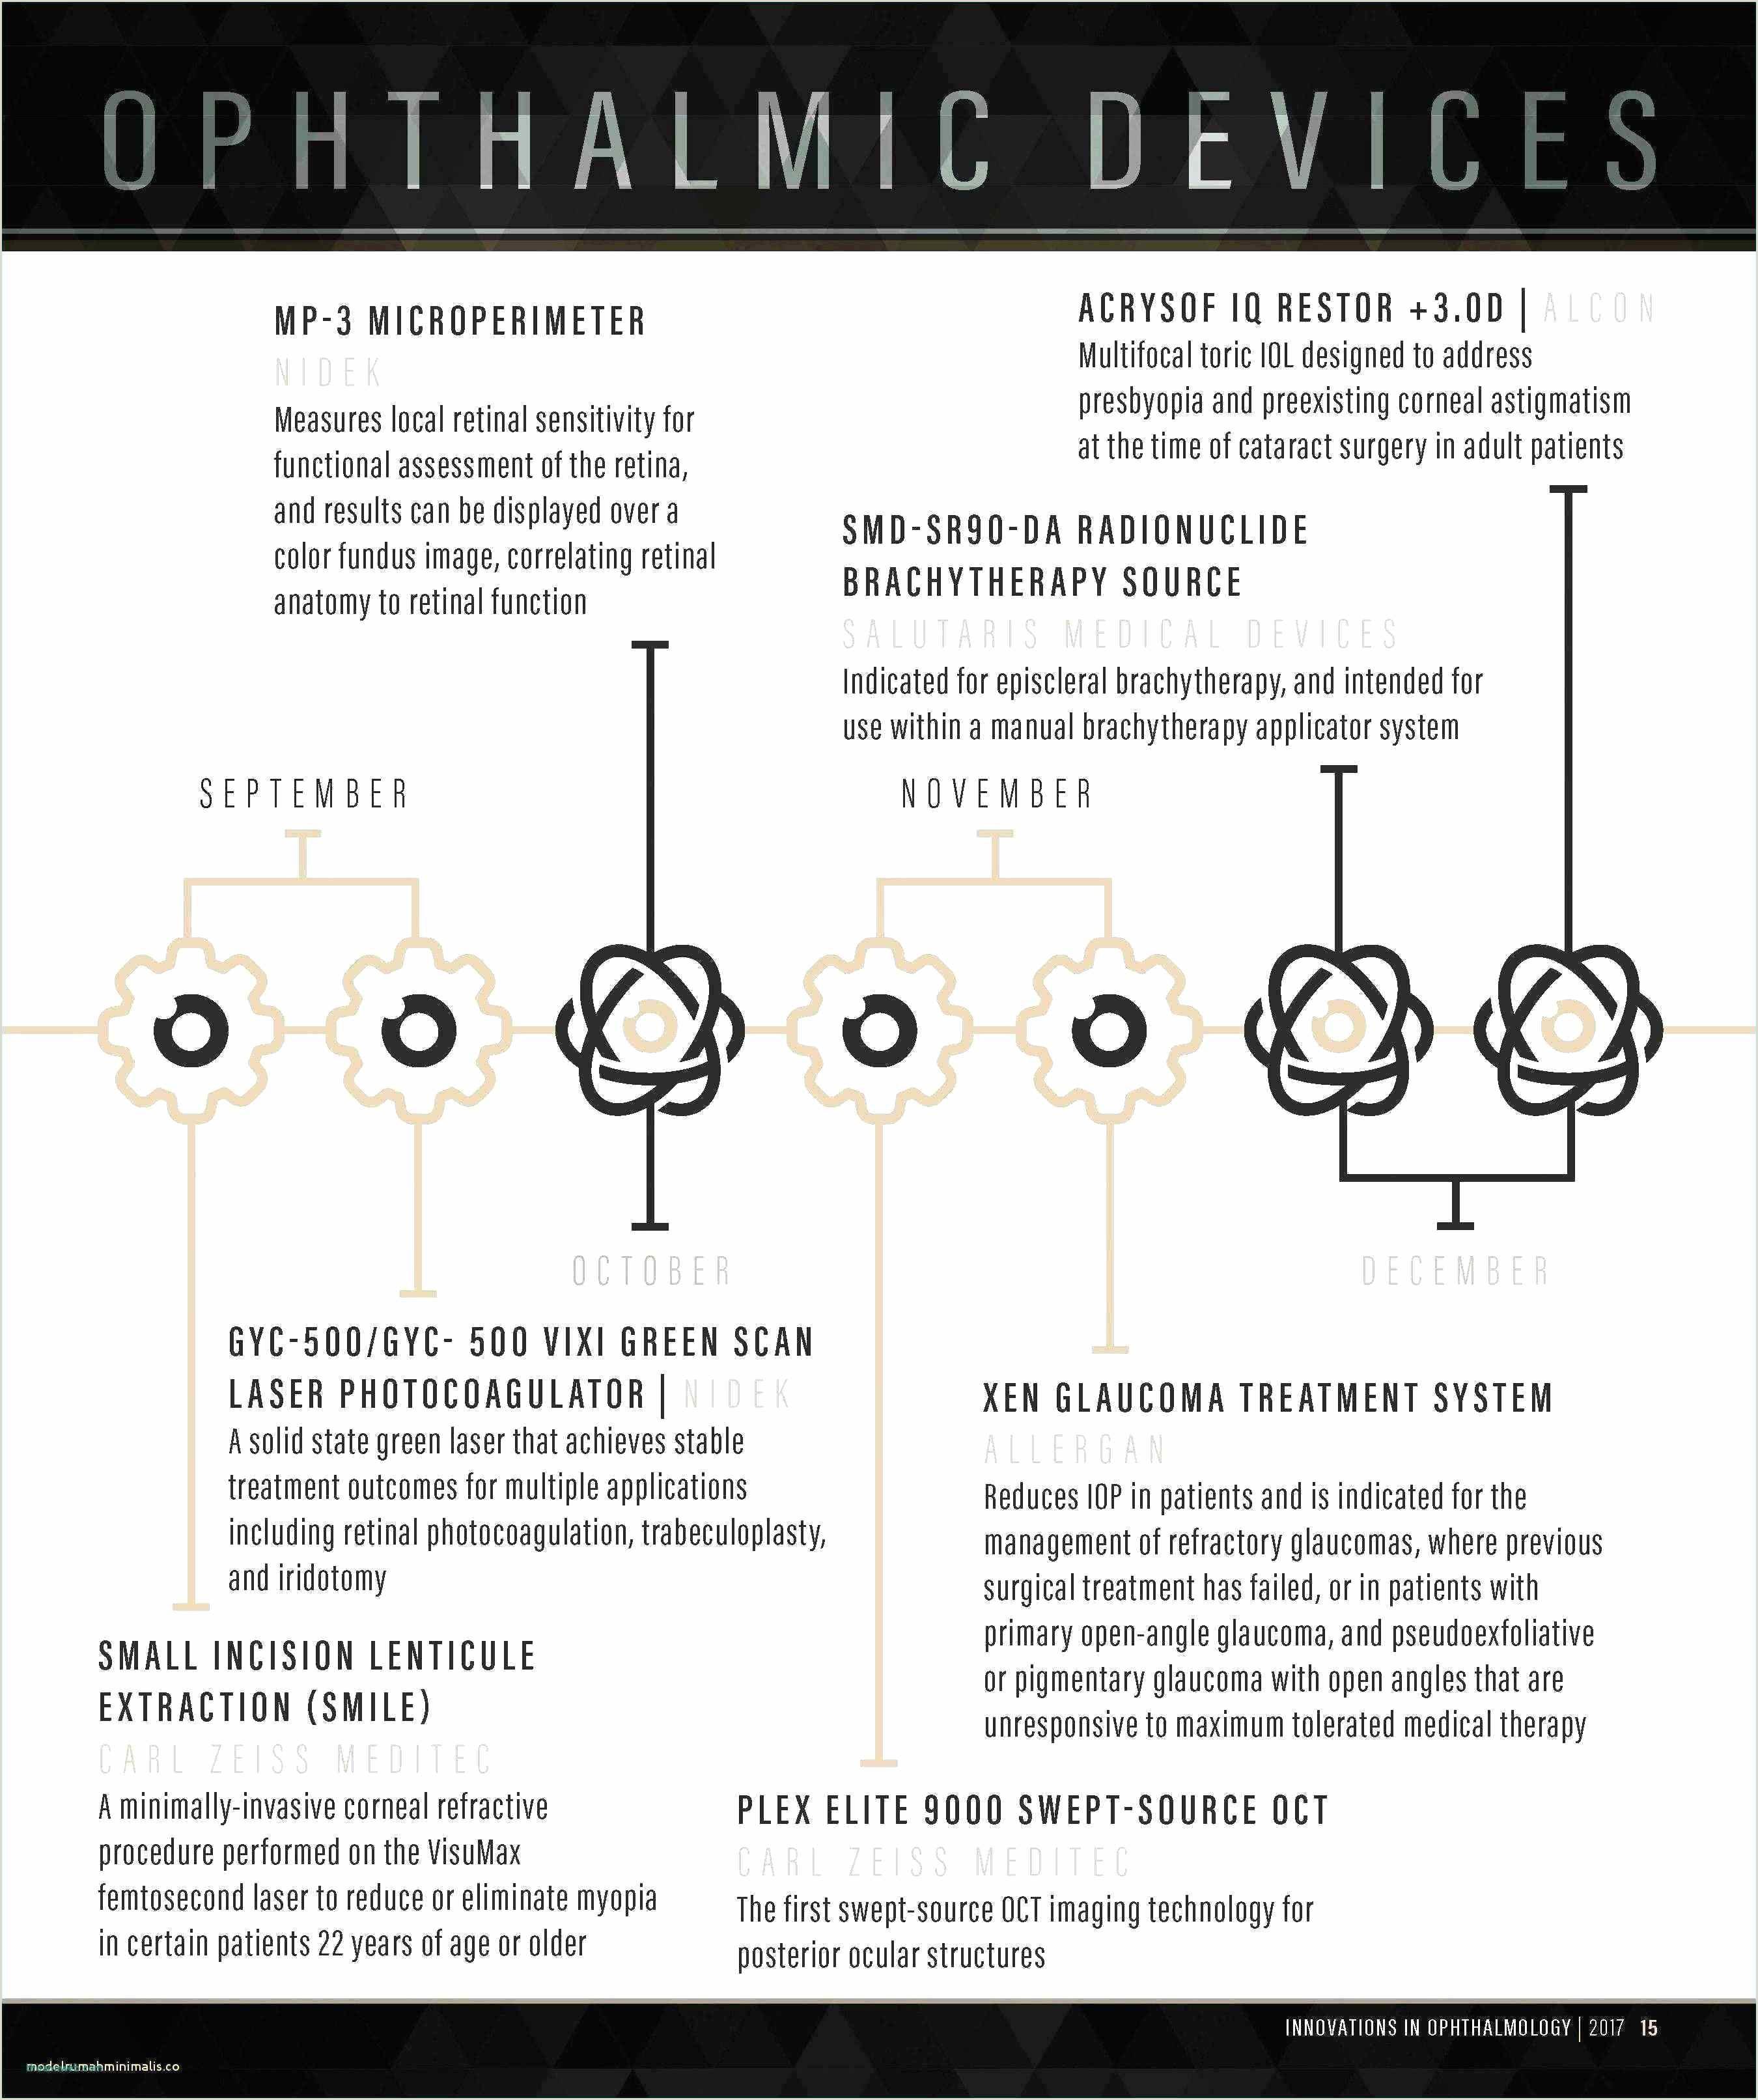 Lebenslauf Muster Pdf Xing Lebenslauf Vorlage Englisch Bild Curriculum Vitae Resume 22